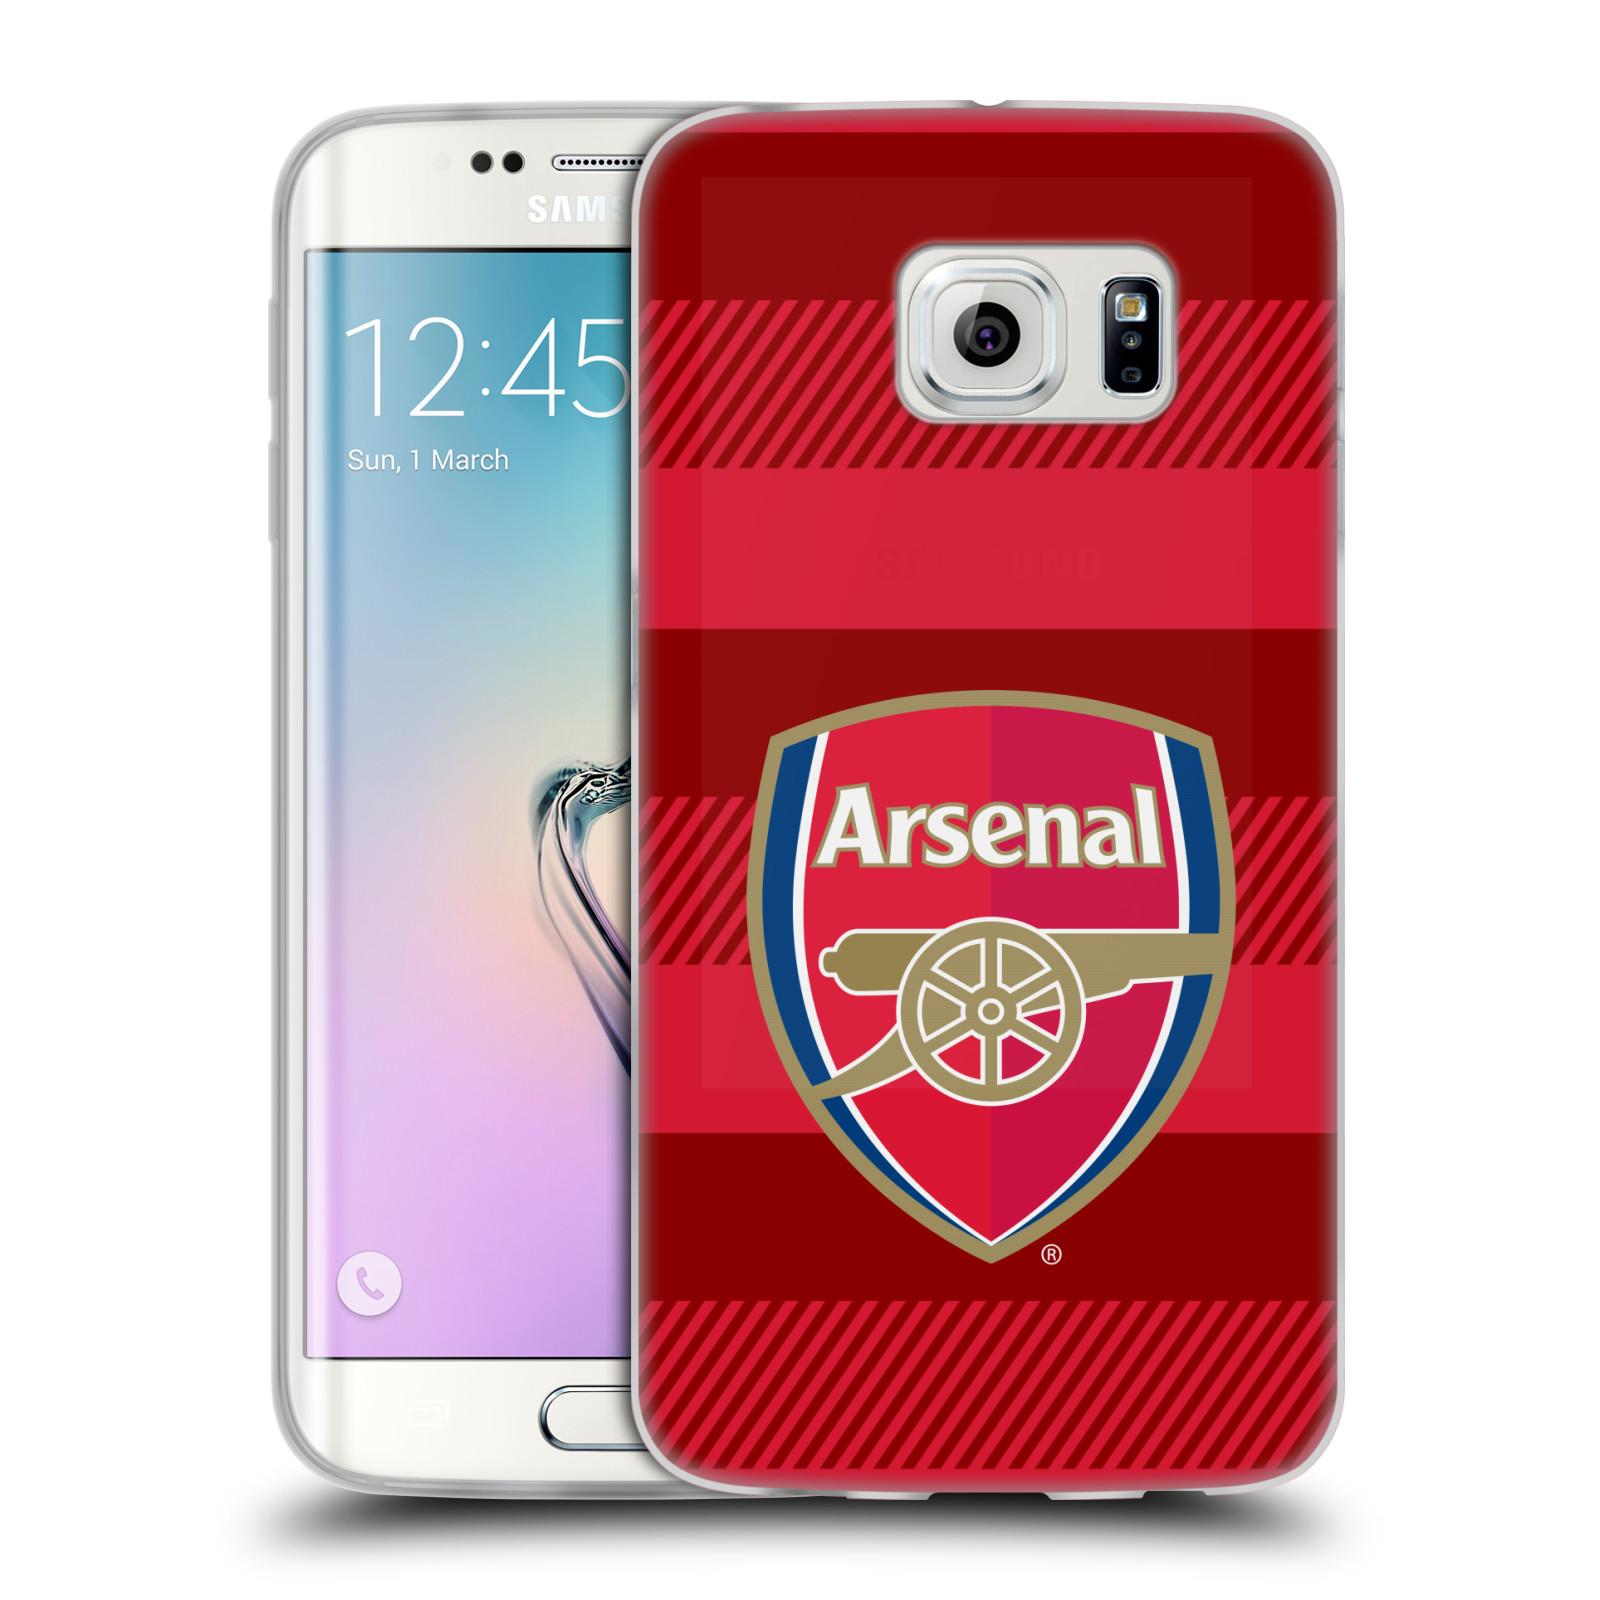 Silikonové pouzdro na mobil Samsung Galaxy S6 Edge - Head Case - Arsenal FC - Logo s pruhy